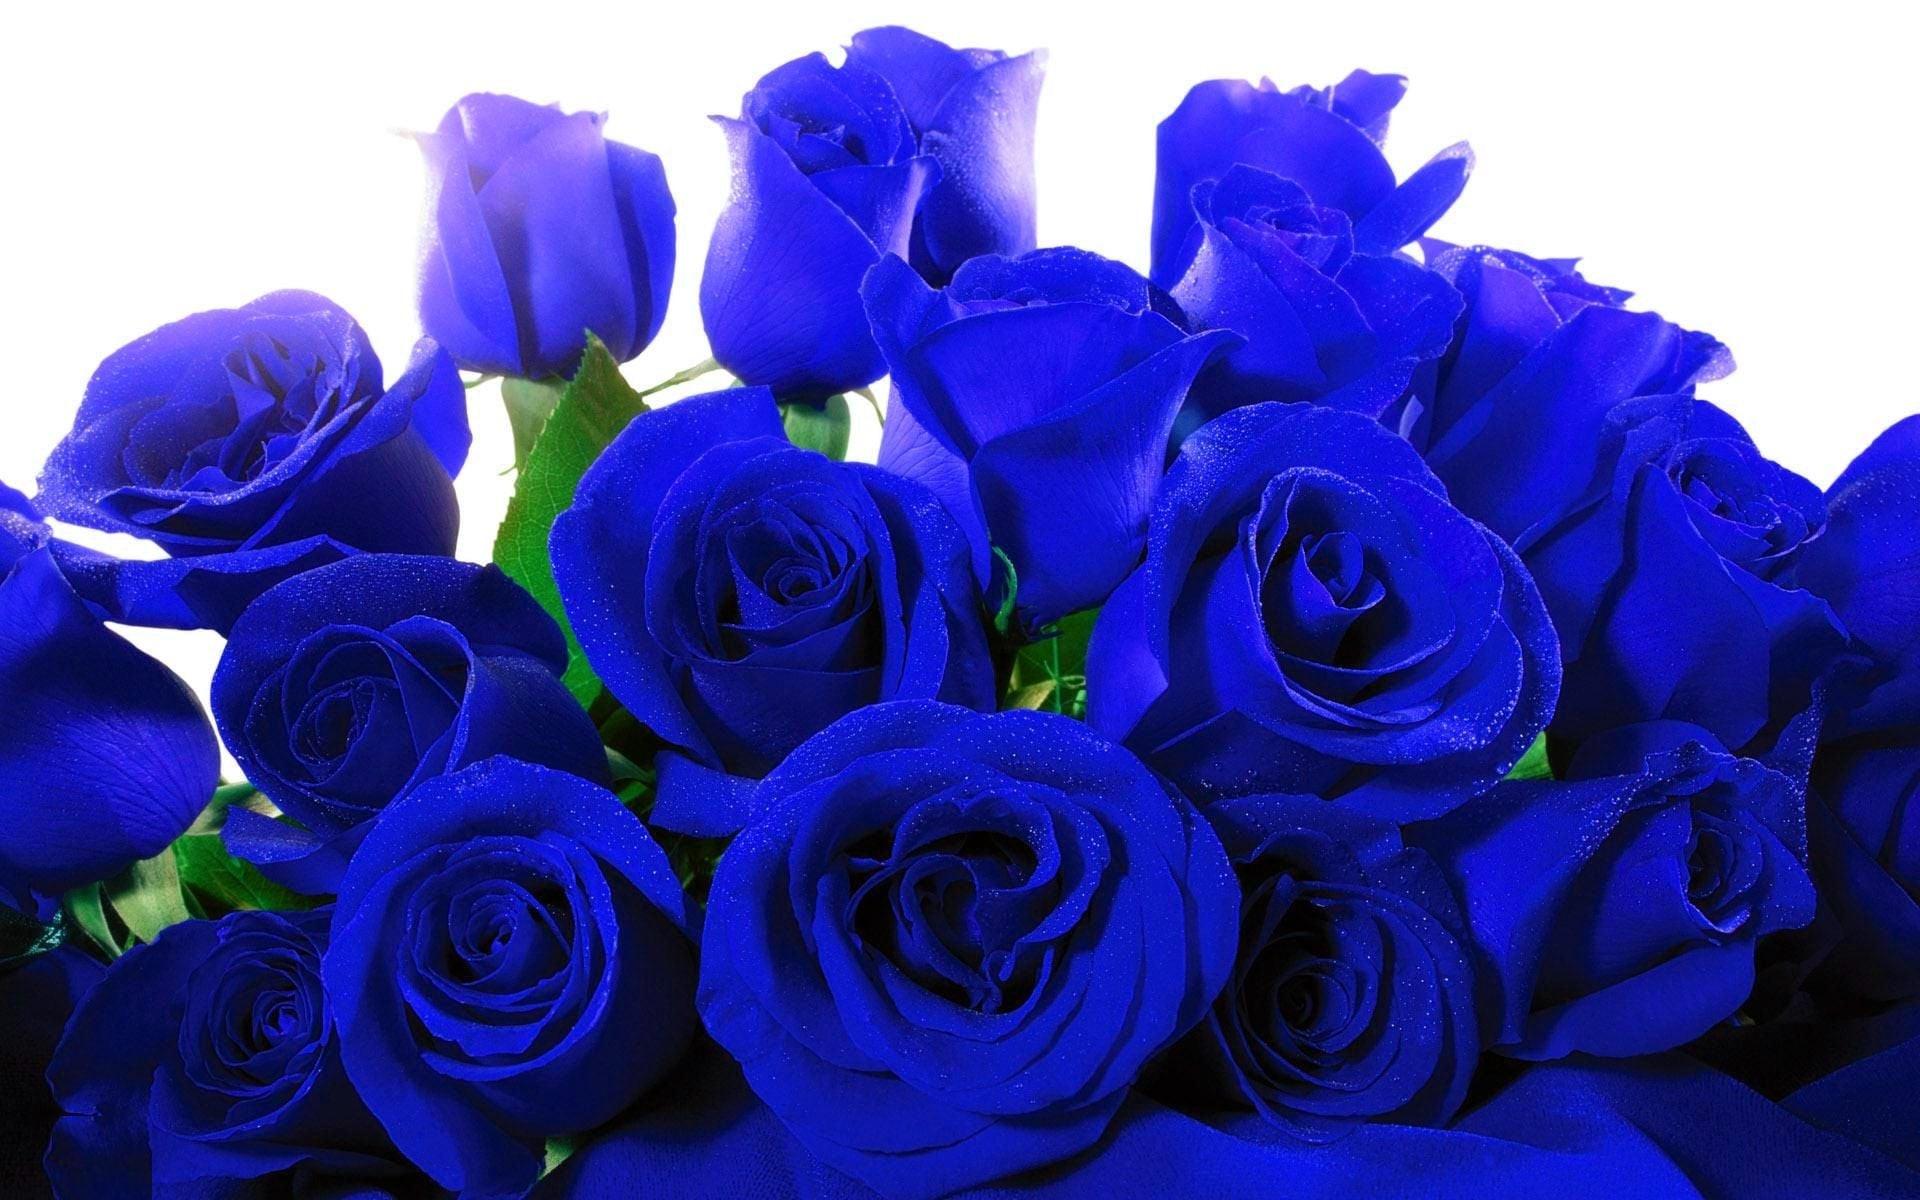 Blue Roses Wallpaper 58+ images